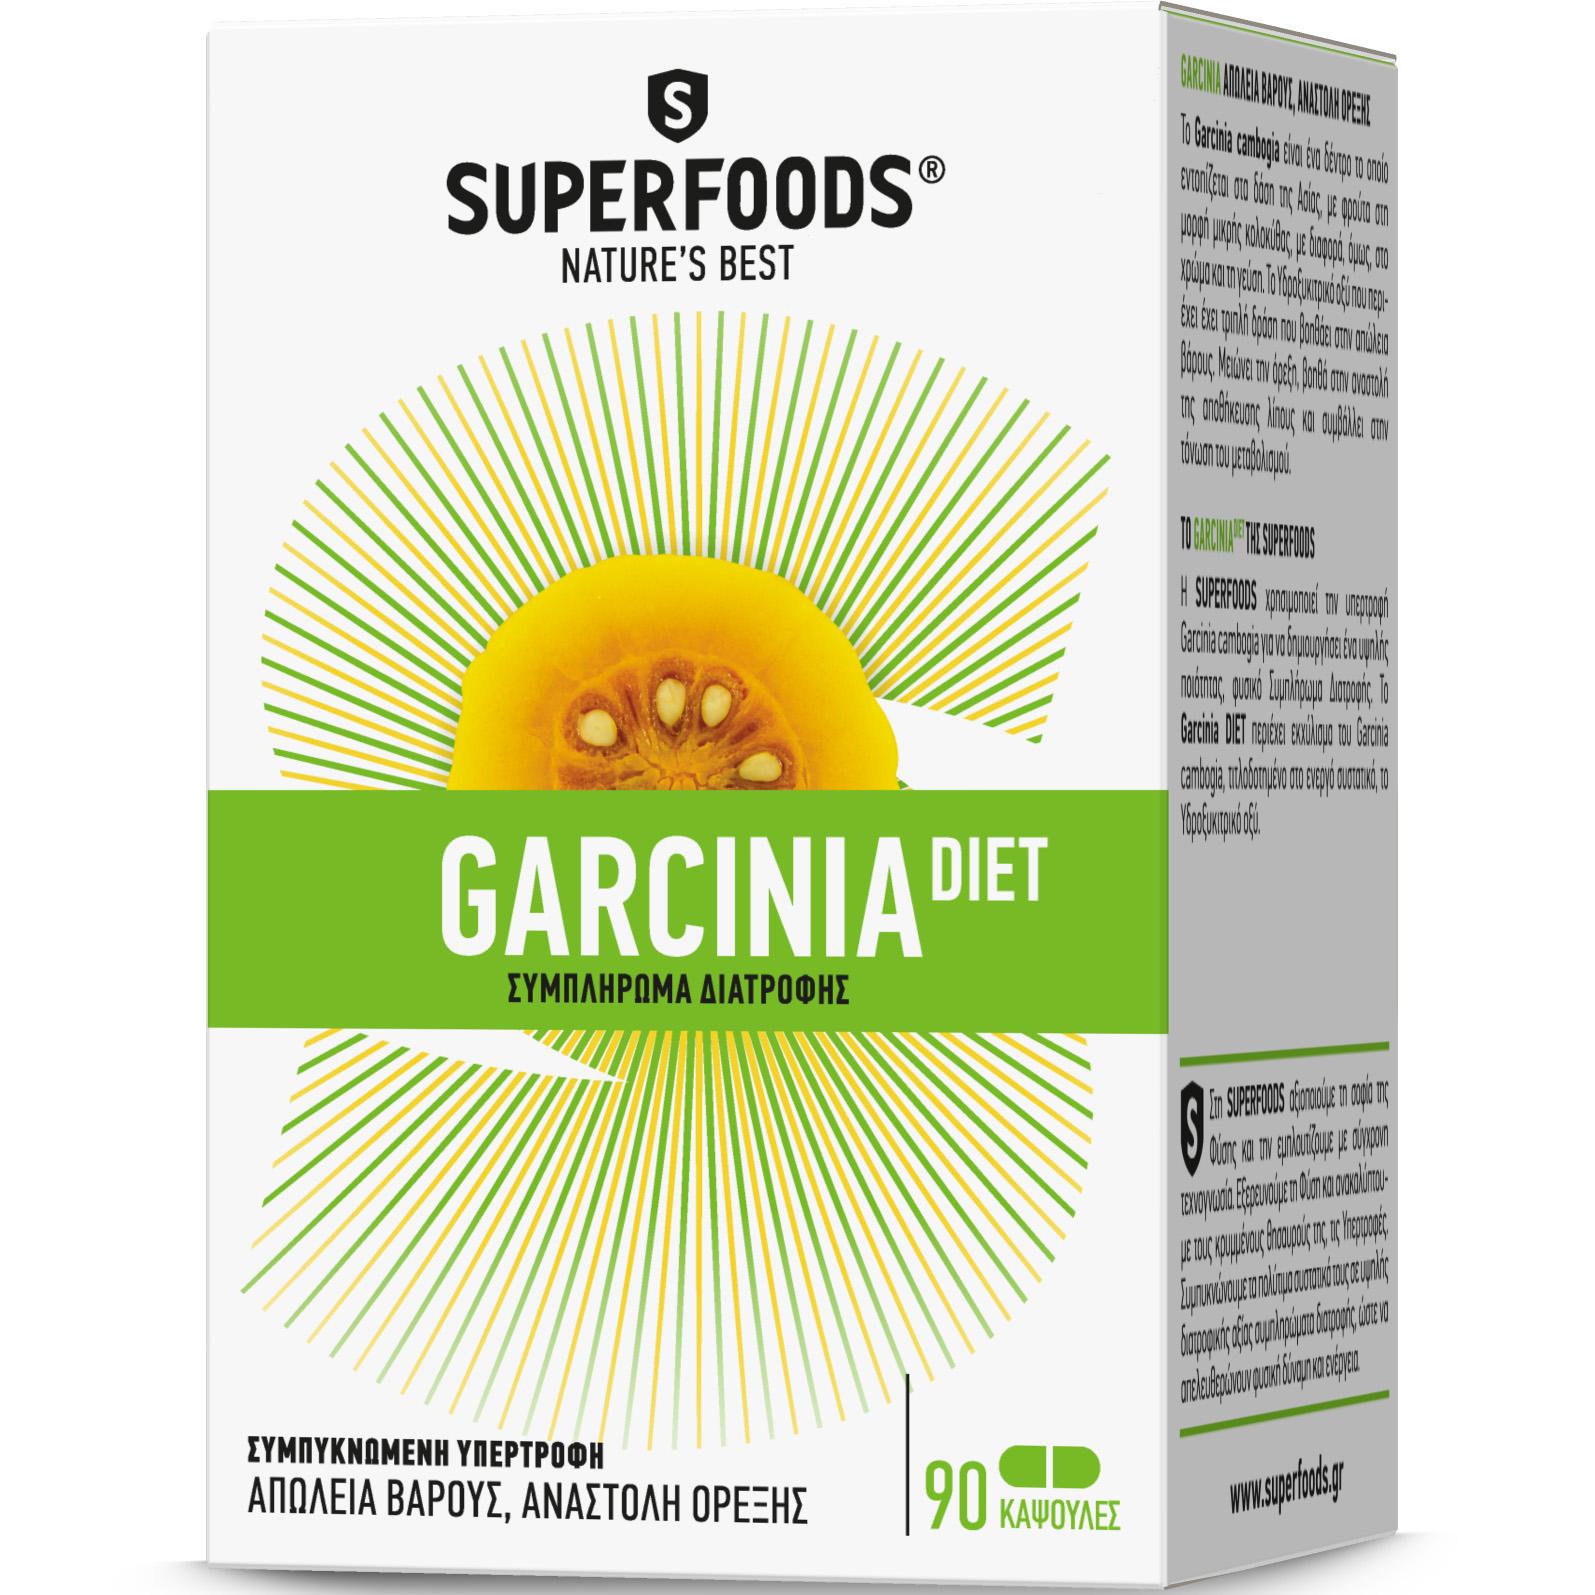 Superfoods Garcinia Diet Συμπλήρωμα Διατροφής γιαΜείωση του Βάρους 90caps καλοκαίρι   διατροφή και αδυνάτισμα   λιποτροπικά συμπληρώματα διατροφής